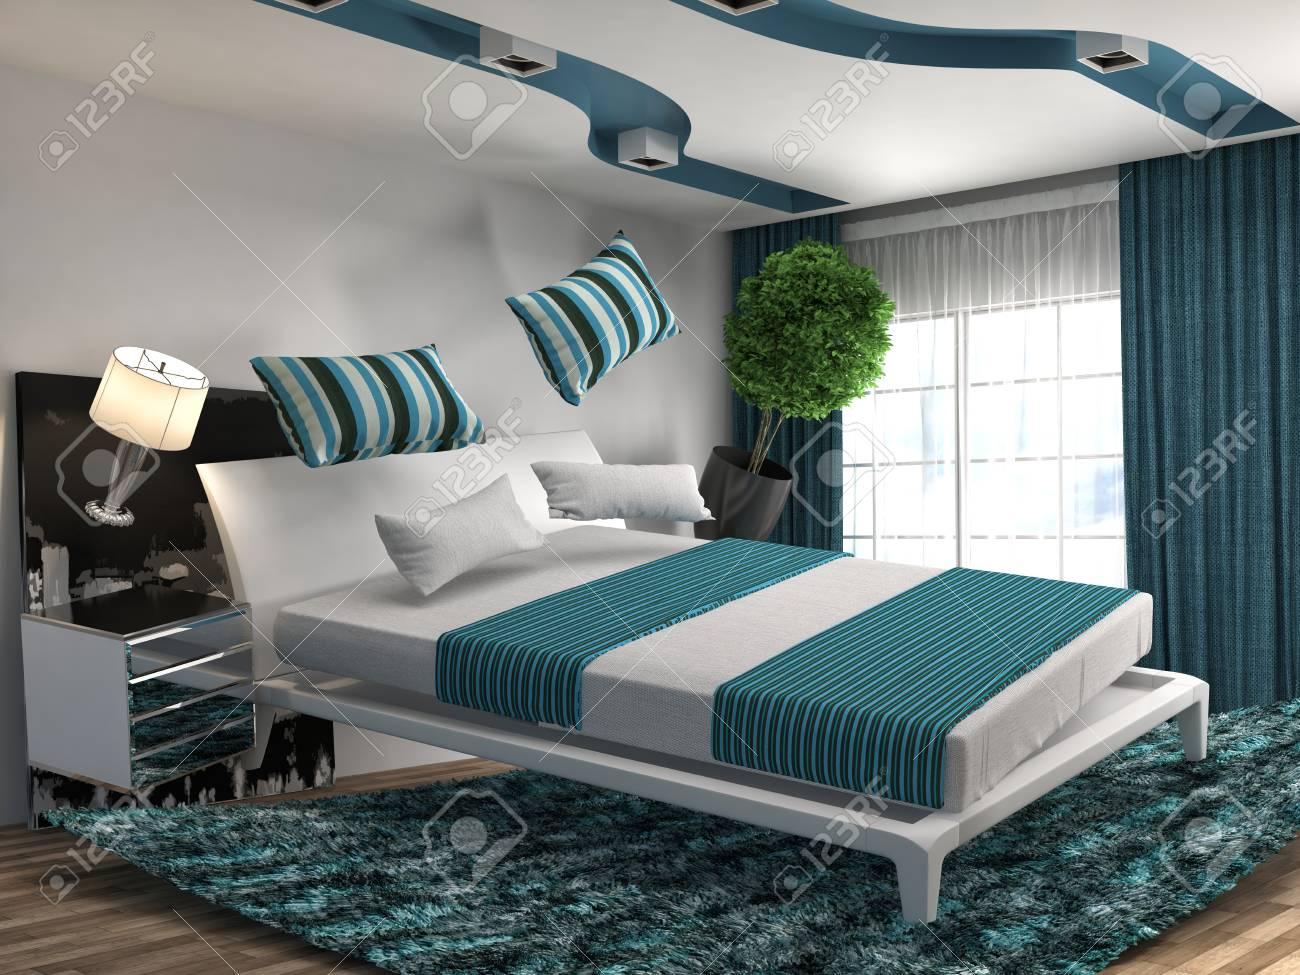 Zero Gravity Bed Hovering In Living Room. 3d Illustration Stock ...